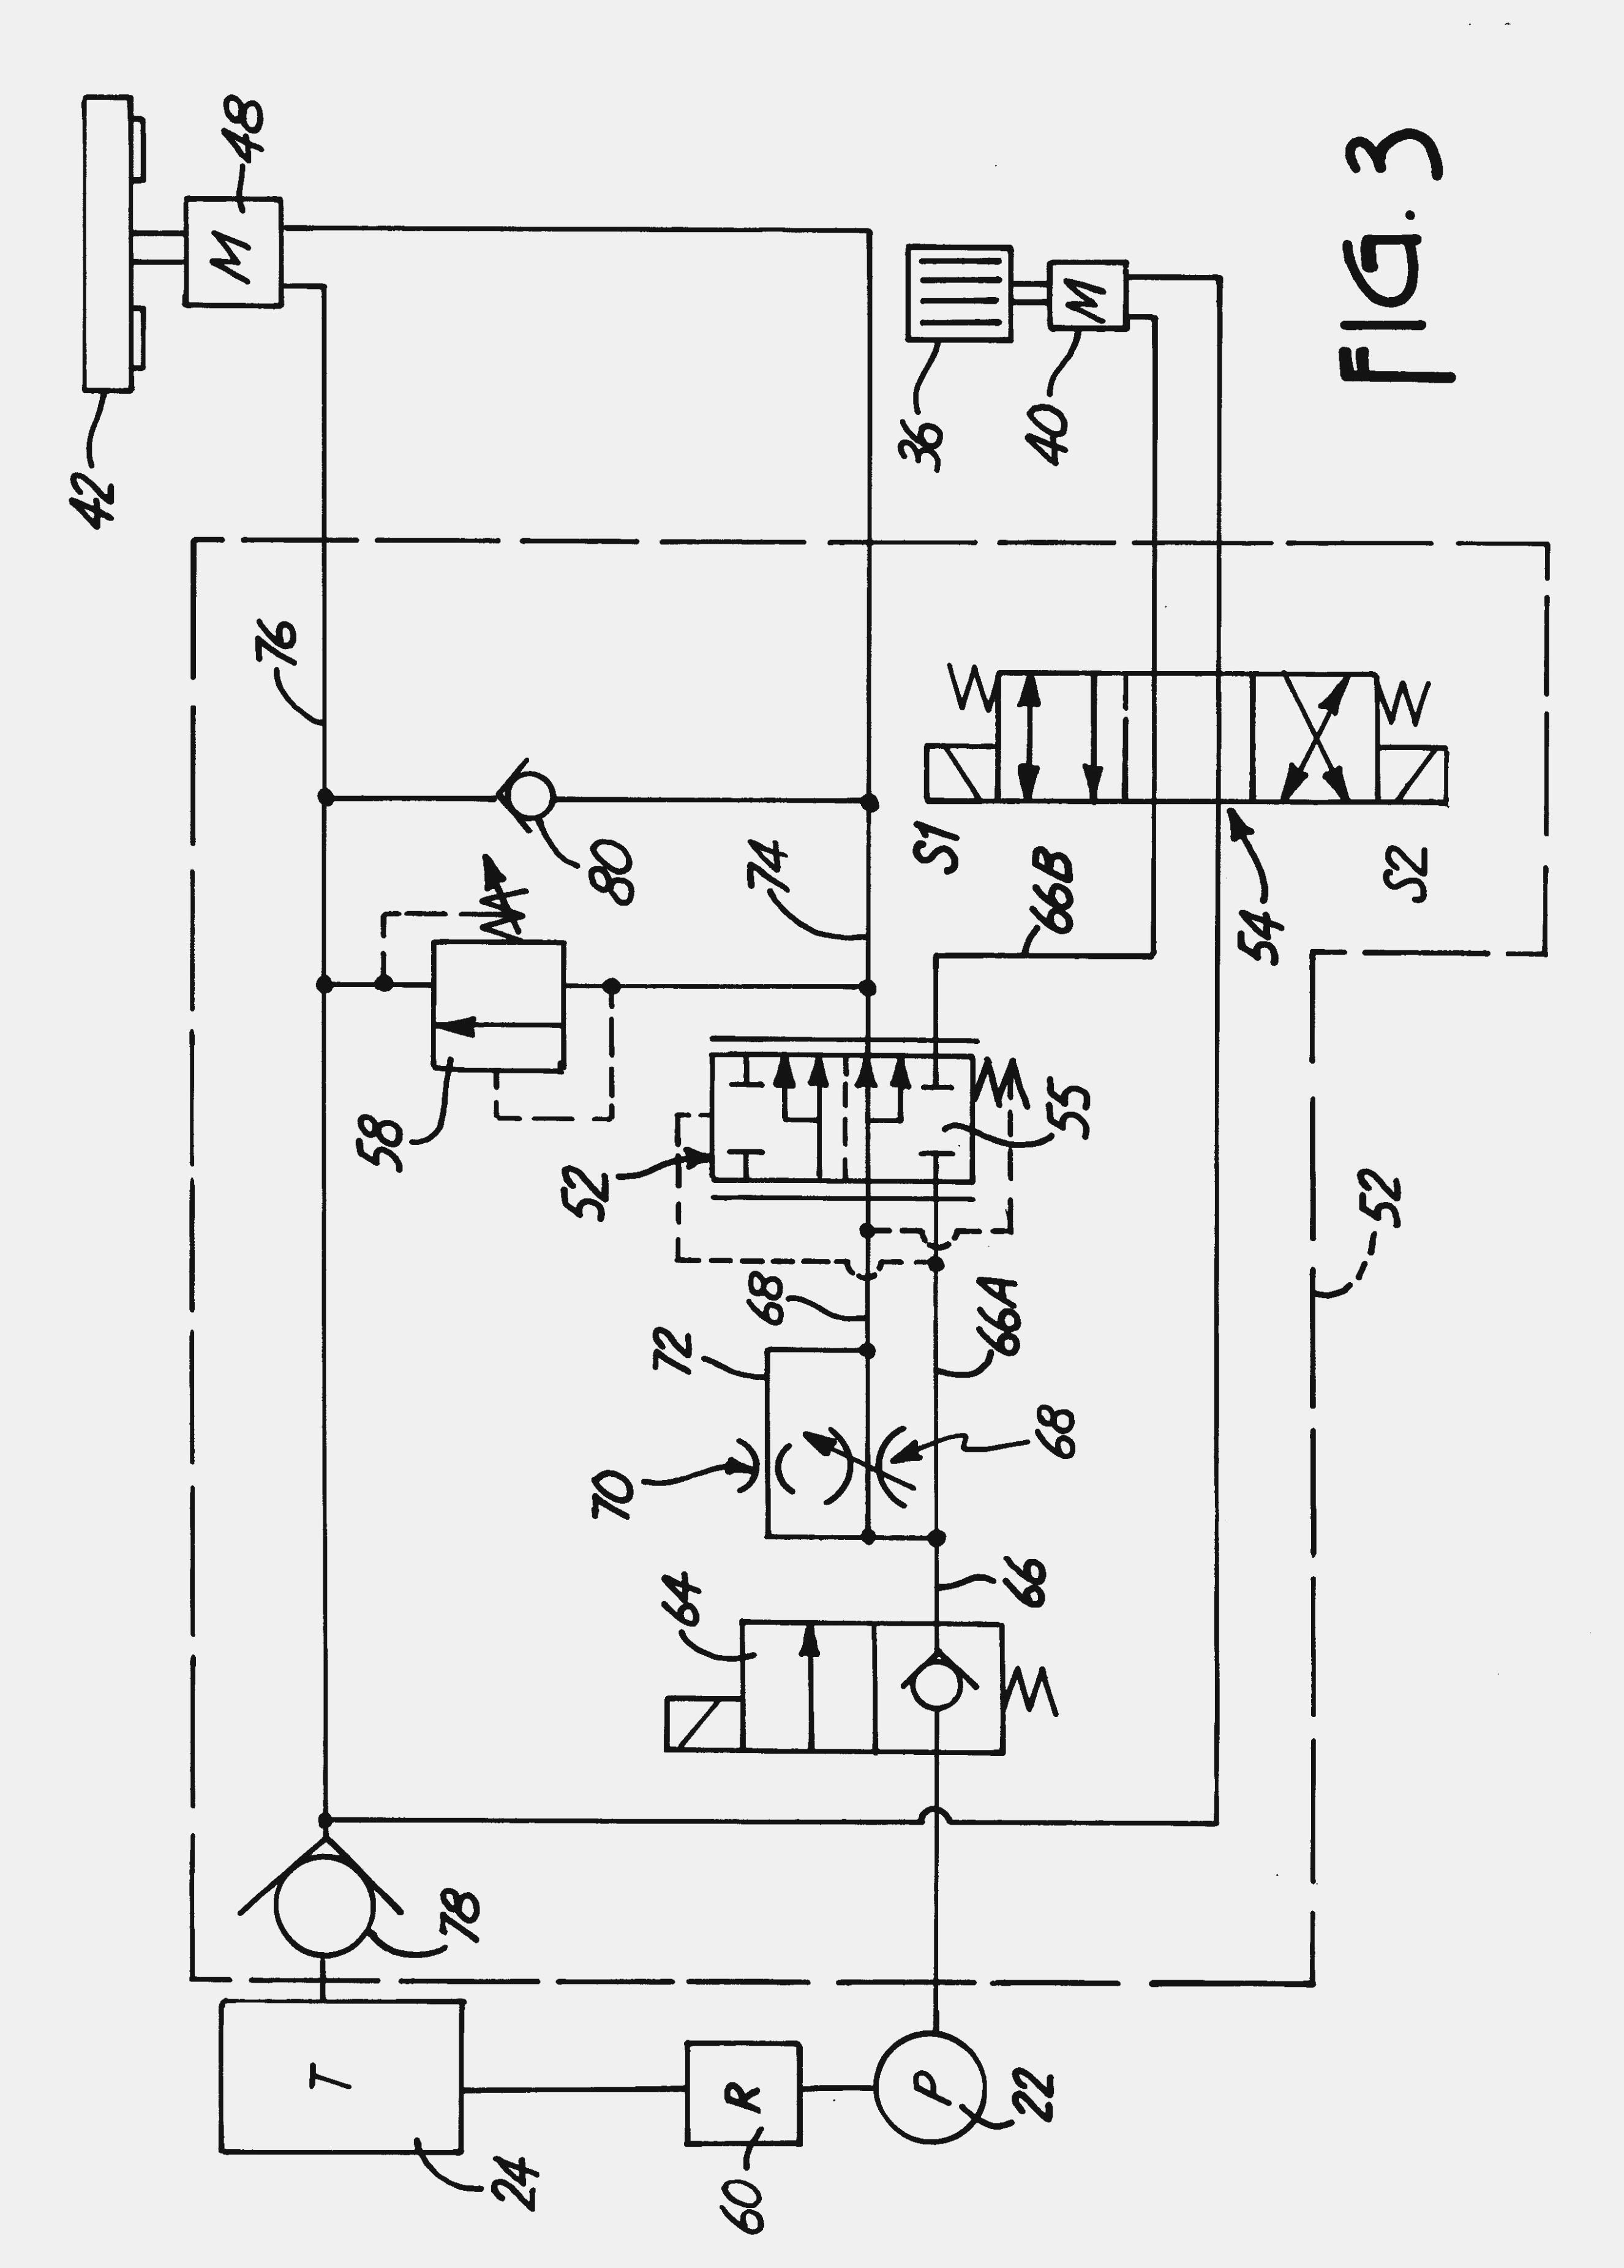 Monarch Dump Motor Wiring Diagram Mm 5922] Car Lift Hydraulic Pump Diagram Download Diagram Of Monarch Dump Motor Wiring Diagram Bucher Hydraulics Wiring Diagram